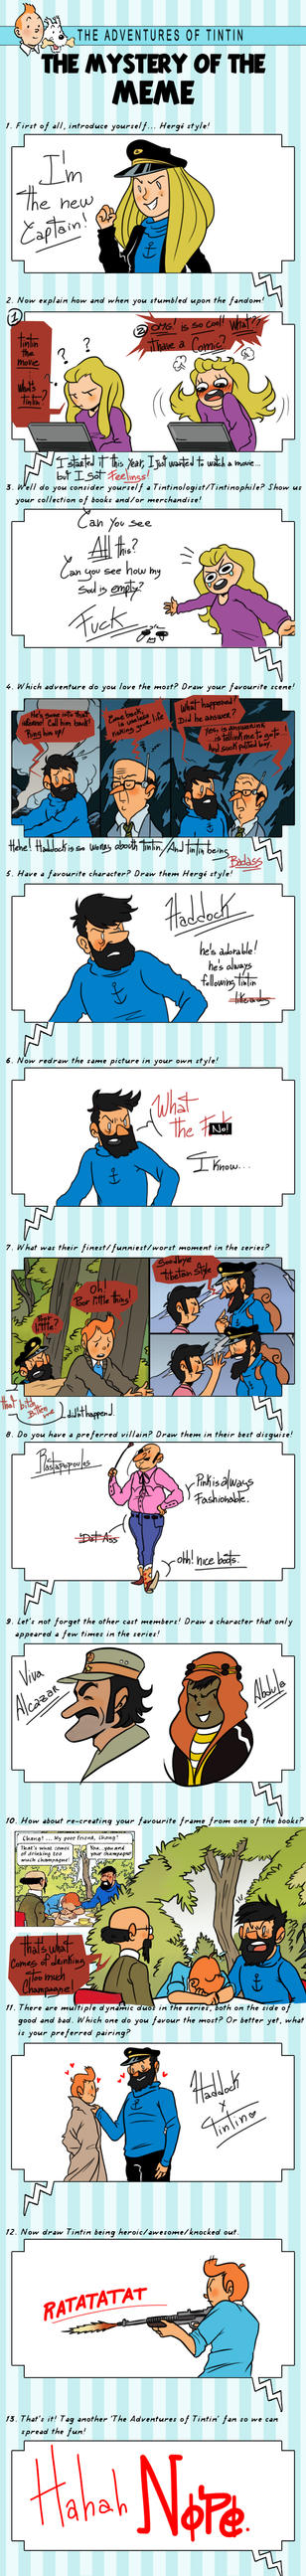 Tintin Meme by AskPrincesMultifruit